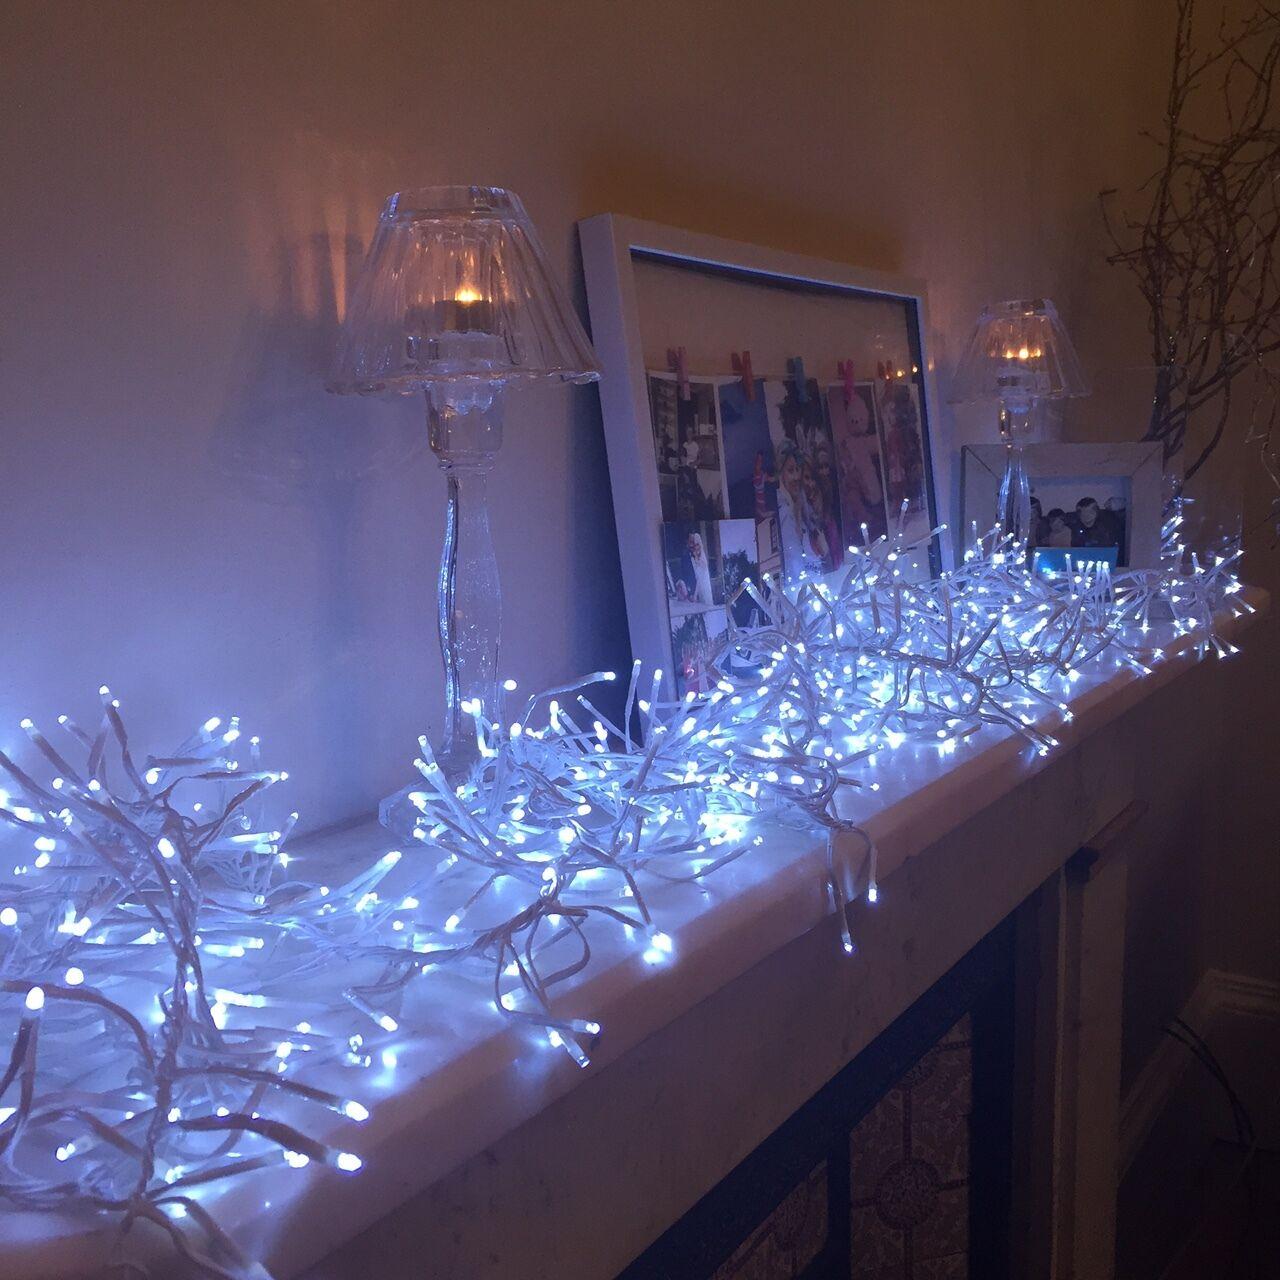 768er led lichterkette cluster weihnachts garten beleuchtung au en lichterkette eur 26 99. Black Bedroom Furniture Sets. Home Design Ideas